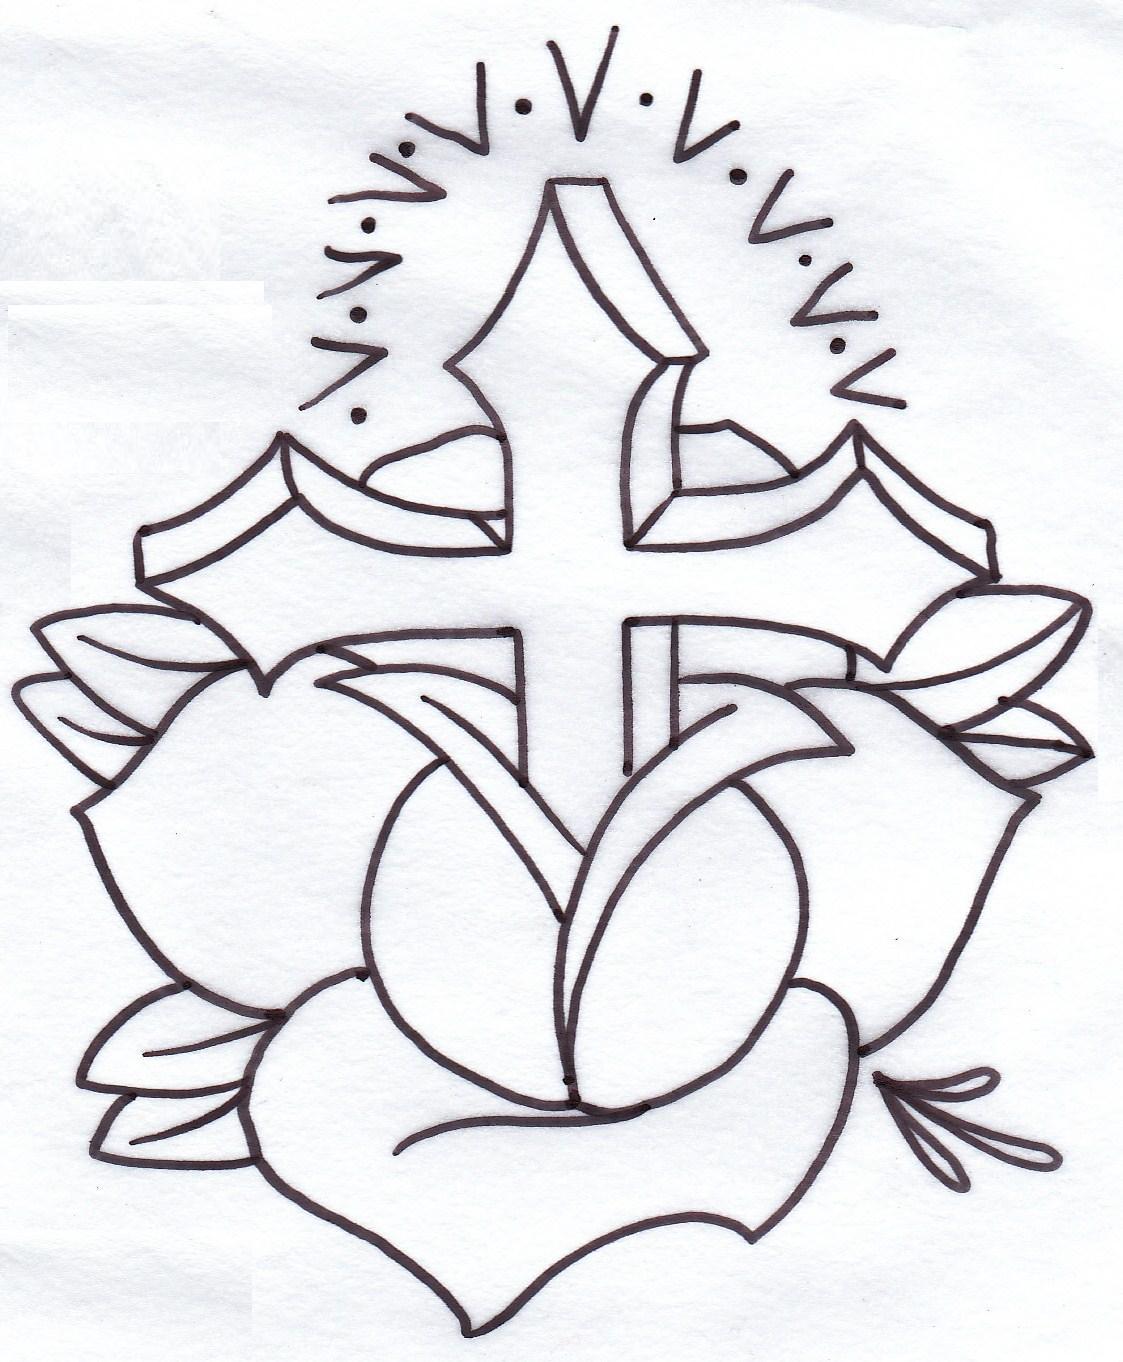 1123x1362 Drawings Of Crosses With Roses Easy Drawings Of Crosses With Roses